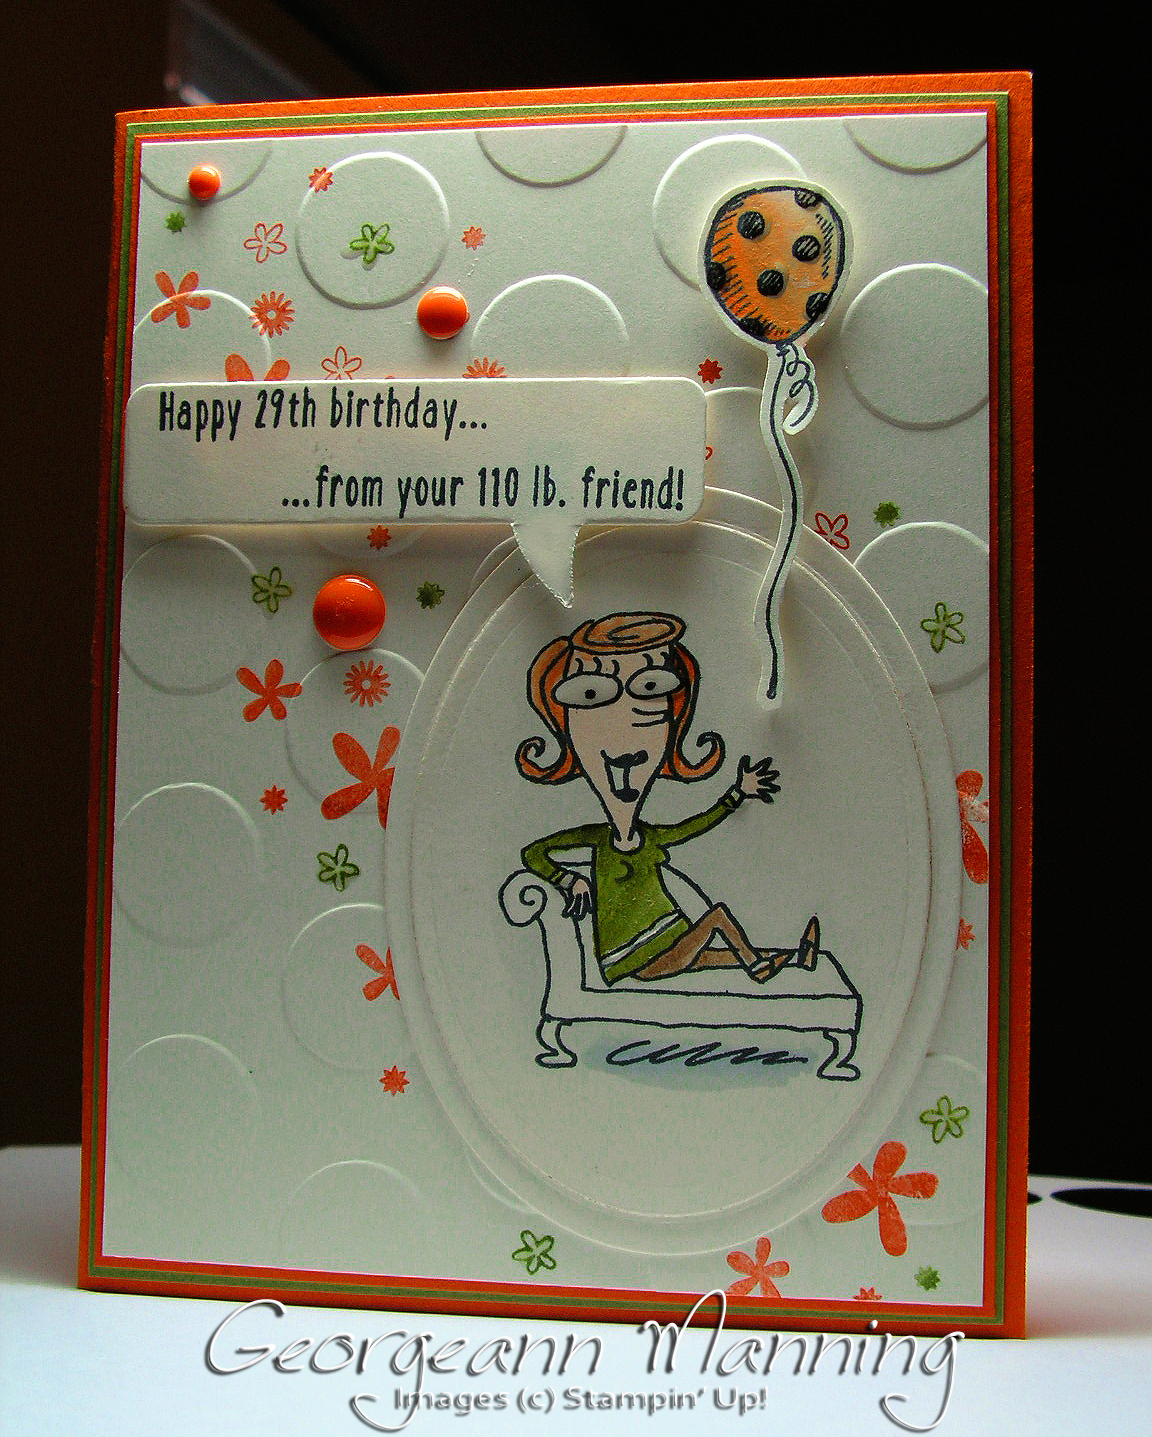 Paper princess just kidding perpetual birthday calendar birthday card just kidding perpetual birthday calendar birthday card m4hsunfo